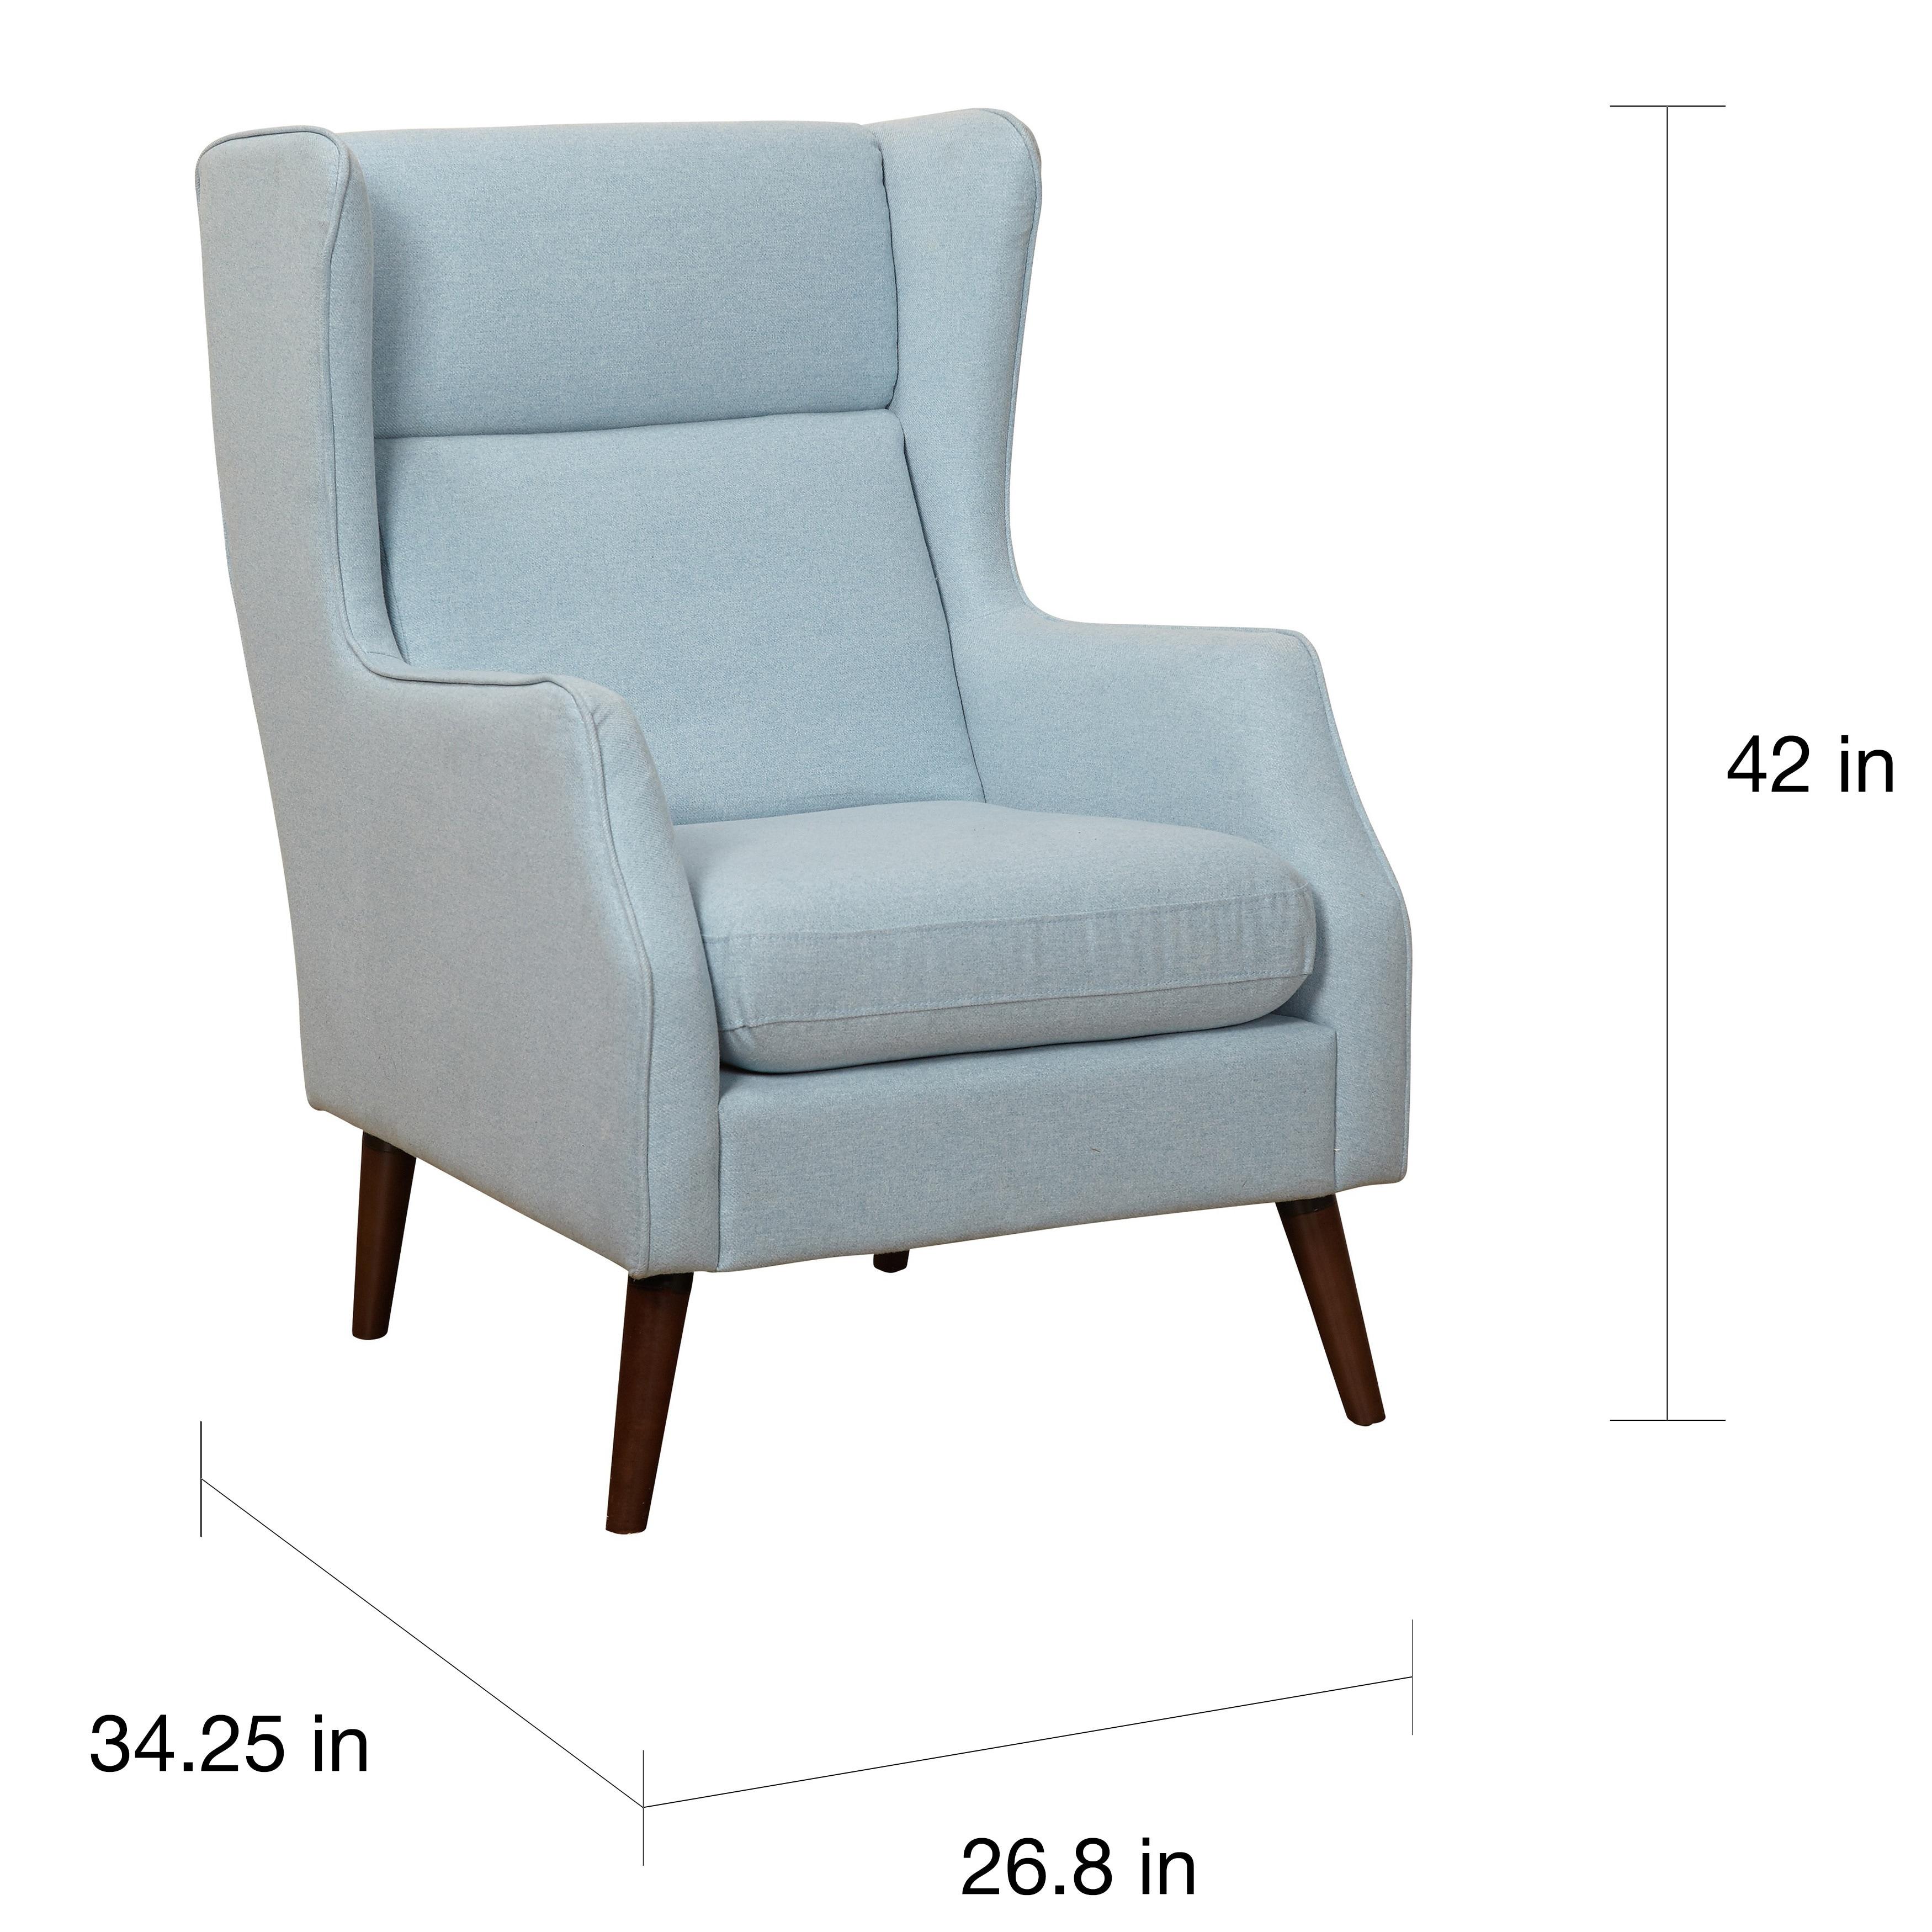 Simple Living Alana Mid Century Light Blue Wing Chair - Free ...